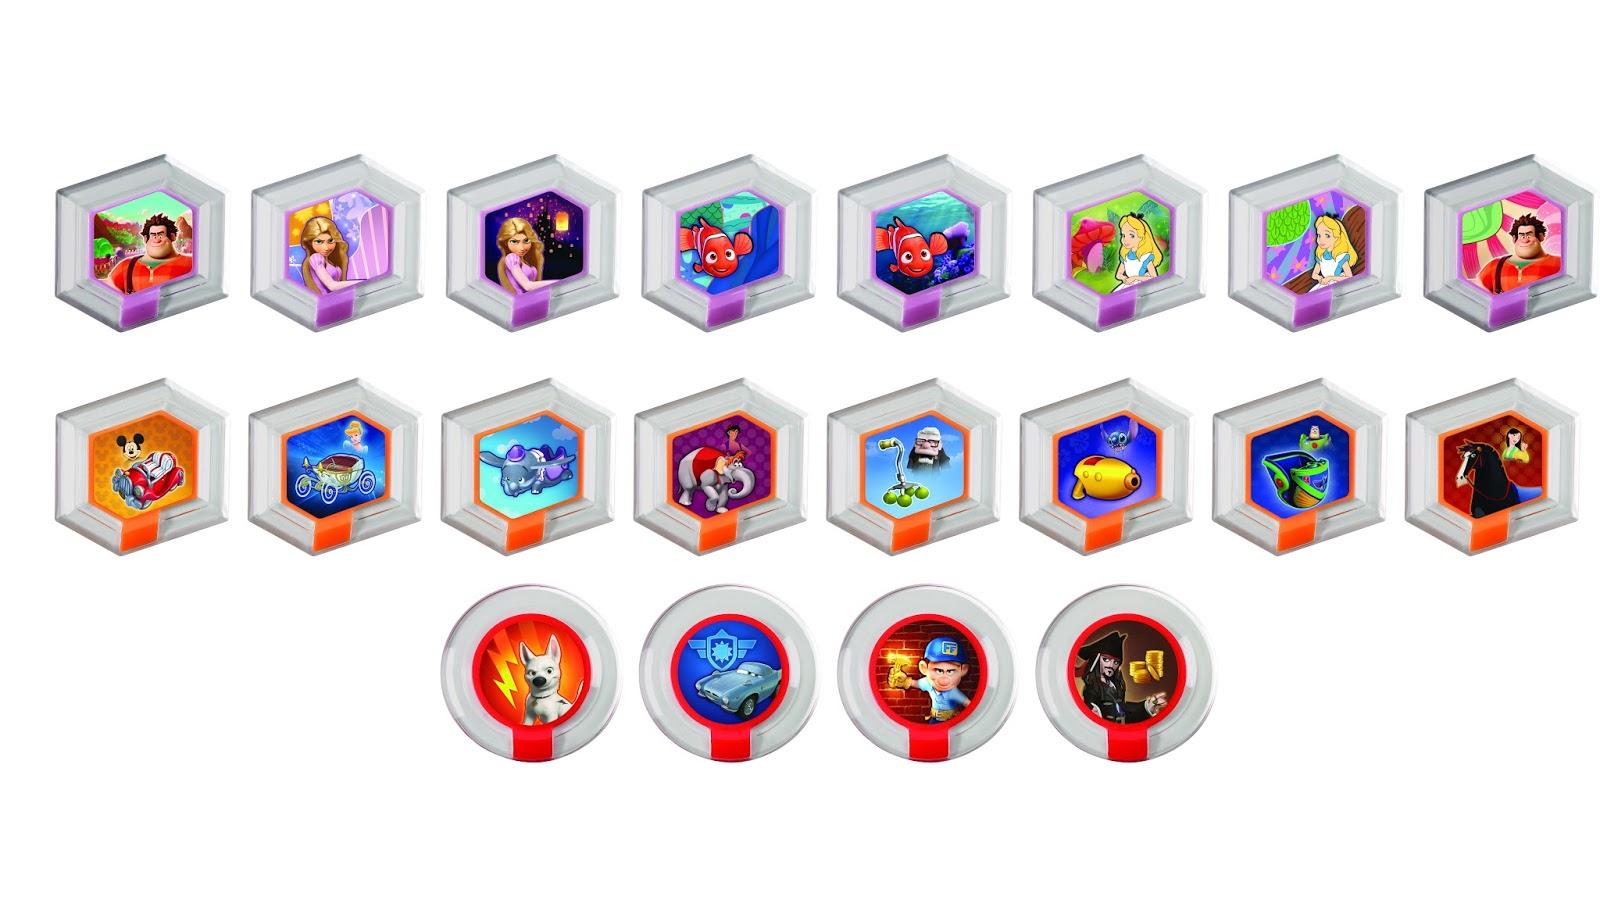 Mashbuttons Disney Infinity Announces Power Discs